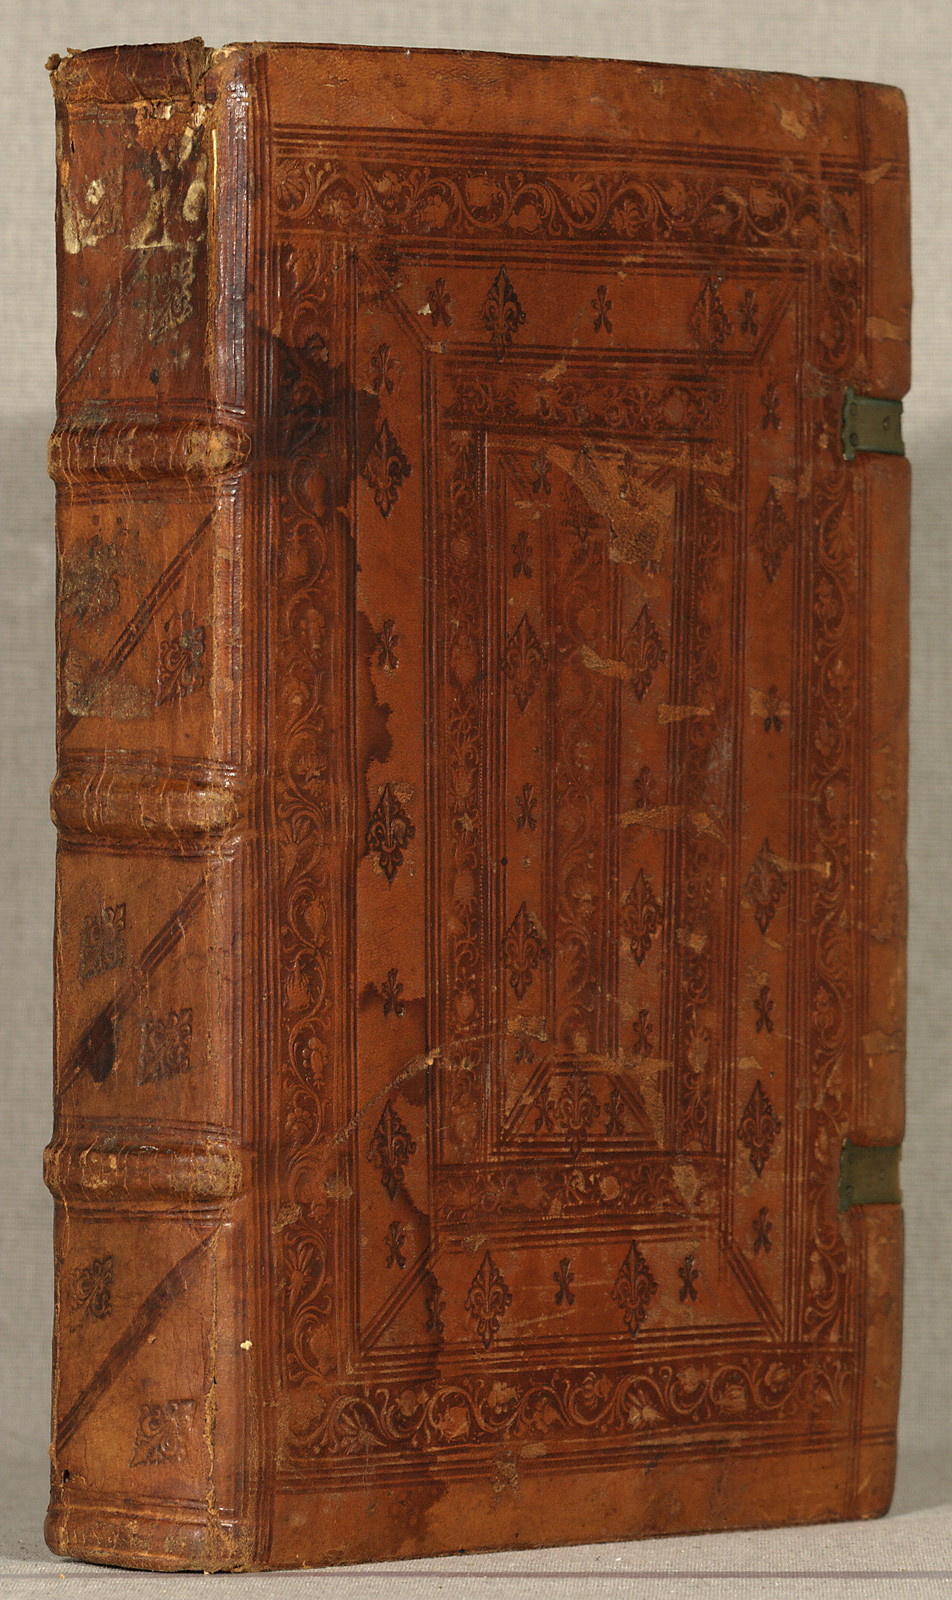 De re militari.Verona, Boninus de Boninis, 13 Feb. 1483.[254] leaves (the first and last blank). woodcuts: illus. 32 cm. (fol.)